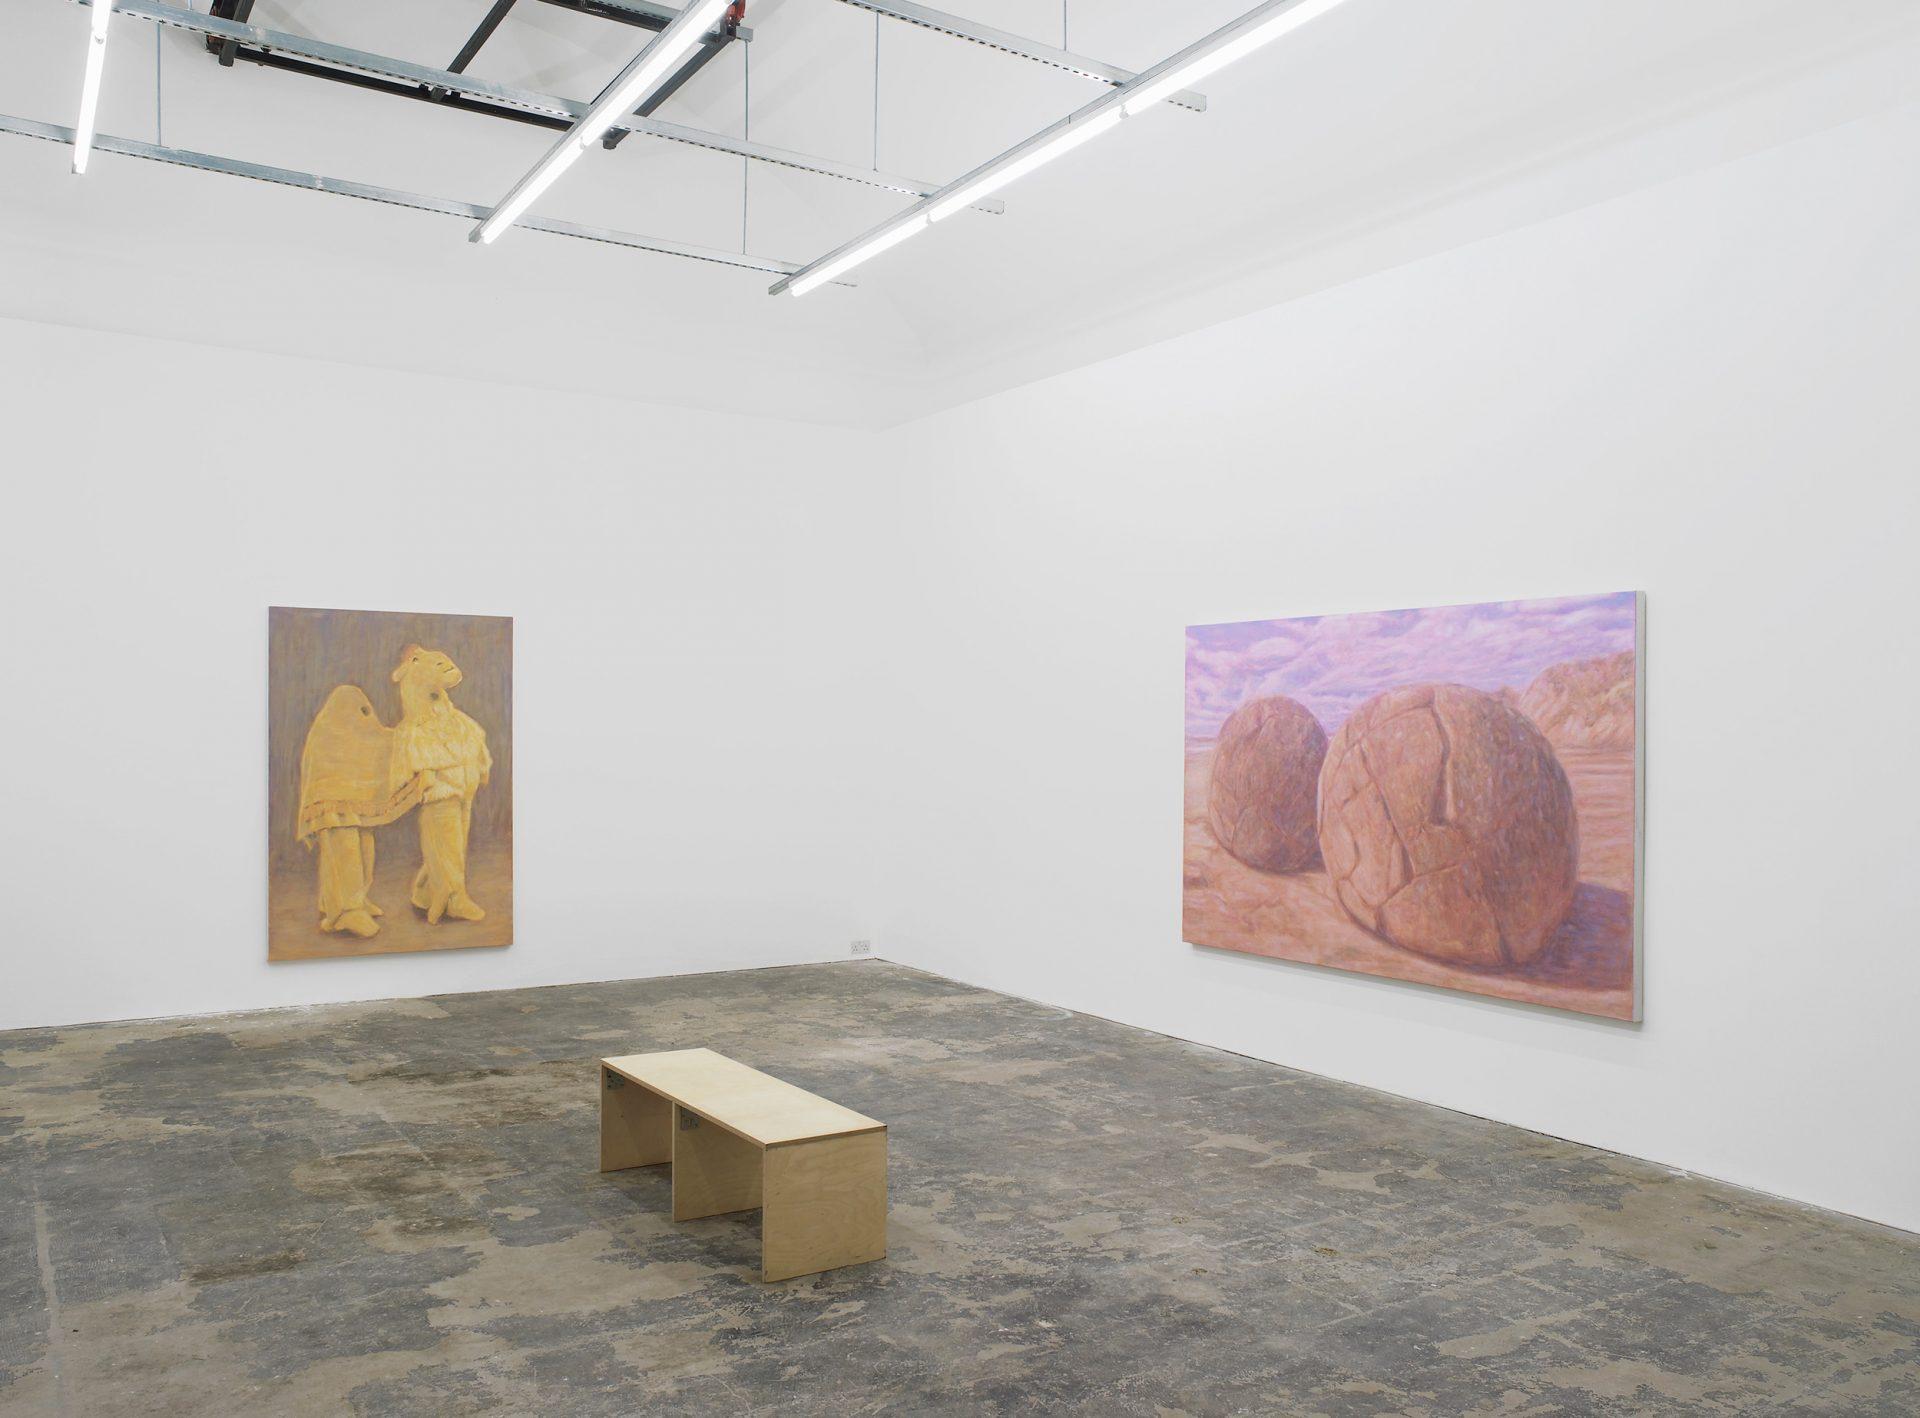 Bruno Pacheco: Sunshine and Sentiment, 2014